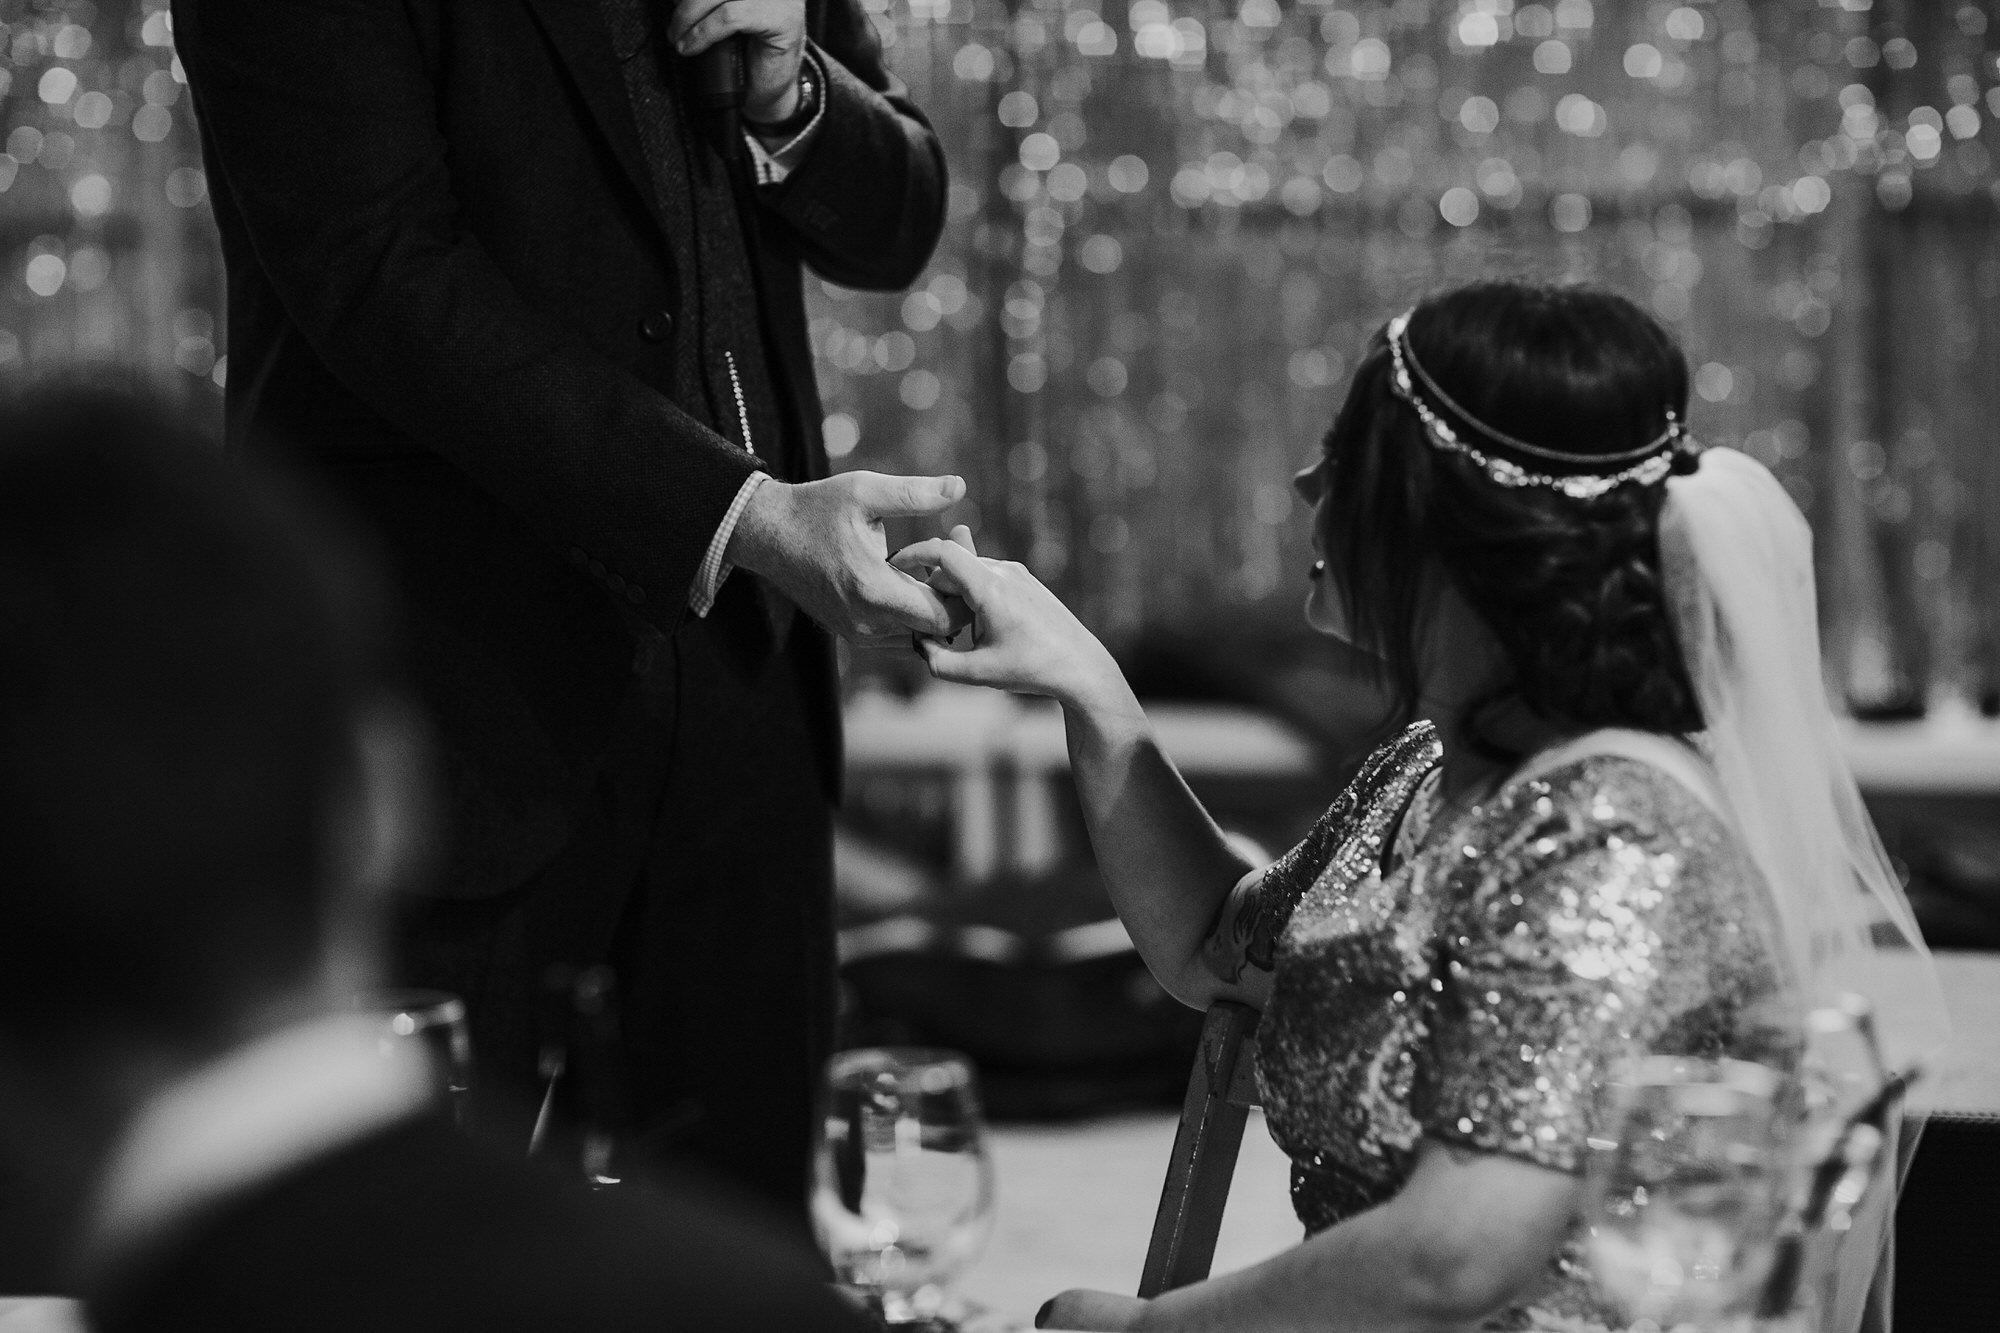 064 TIN SHED KNOCKRAICH FARM WEDDING ALTERNATIVE BRIDE ZOE ALEXANDRA PHOTOGRAPHY